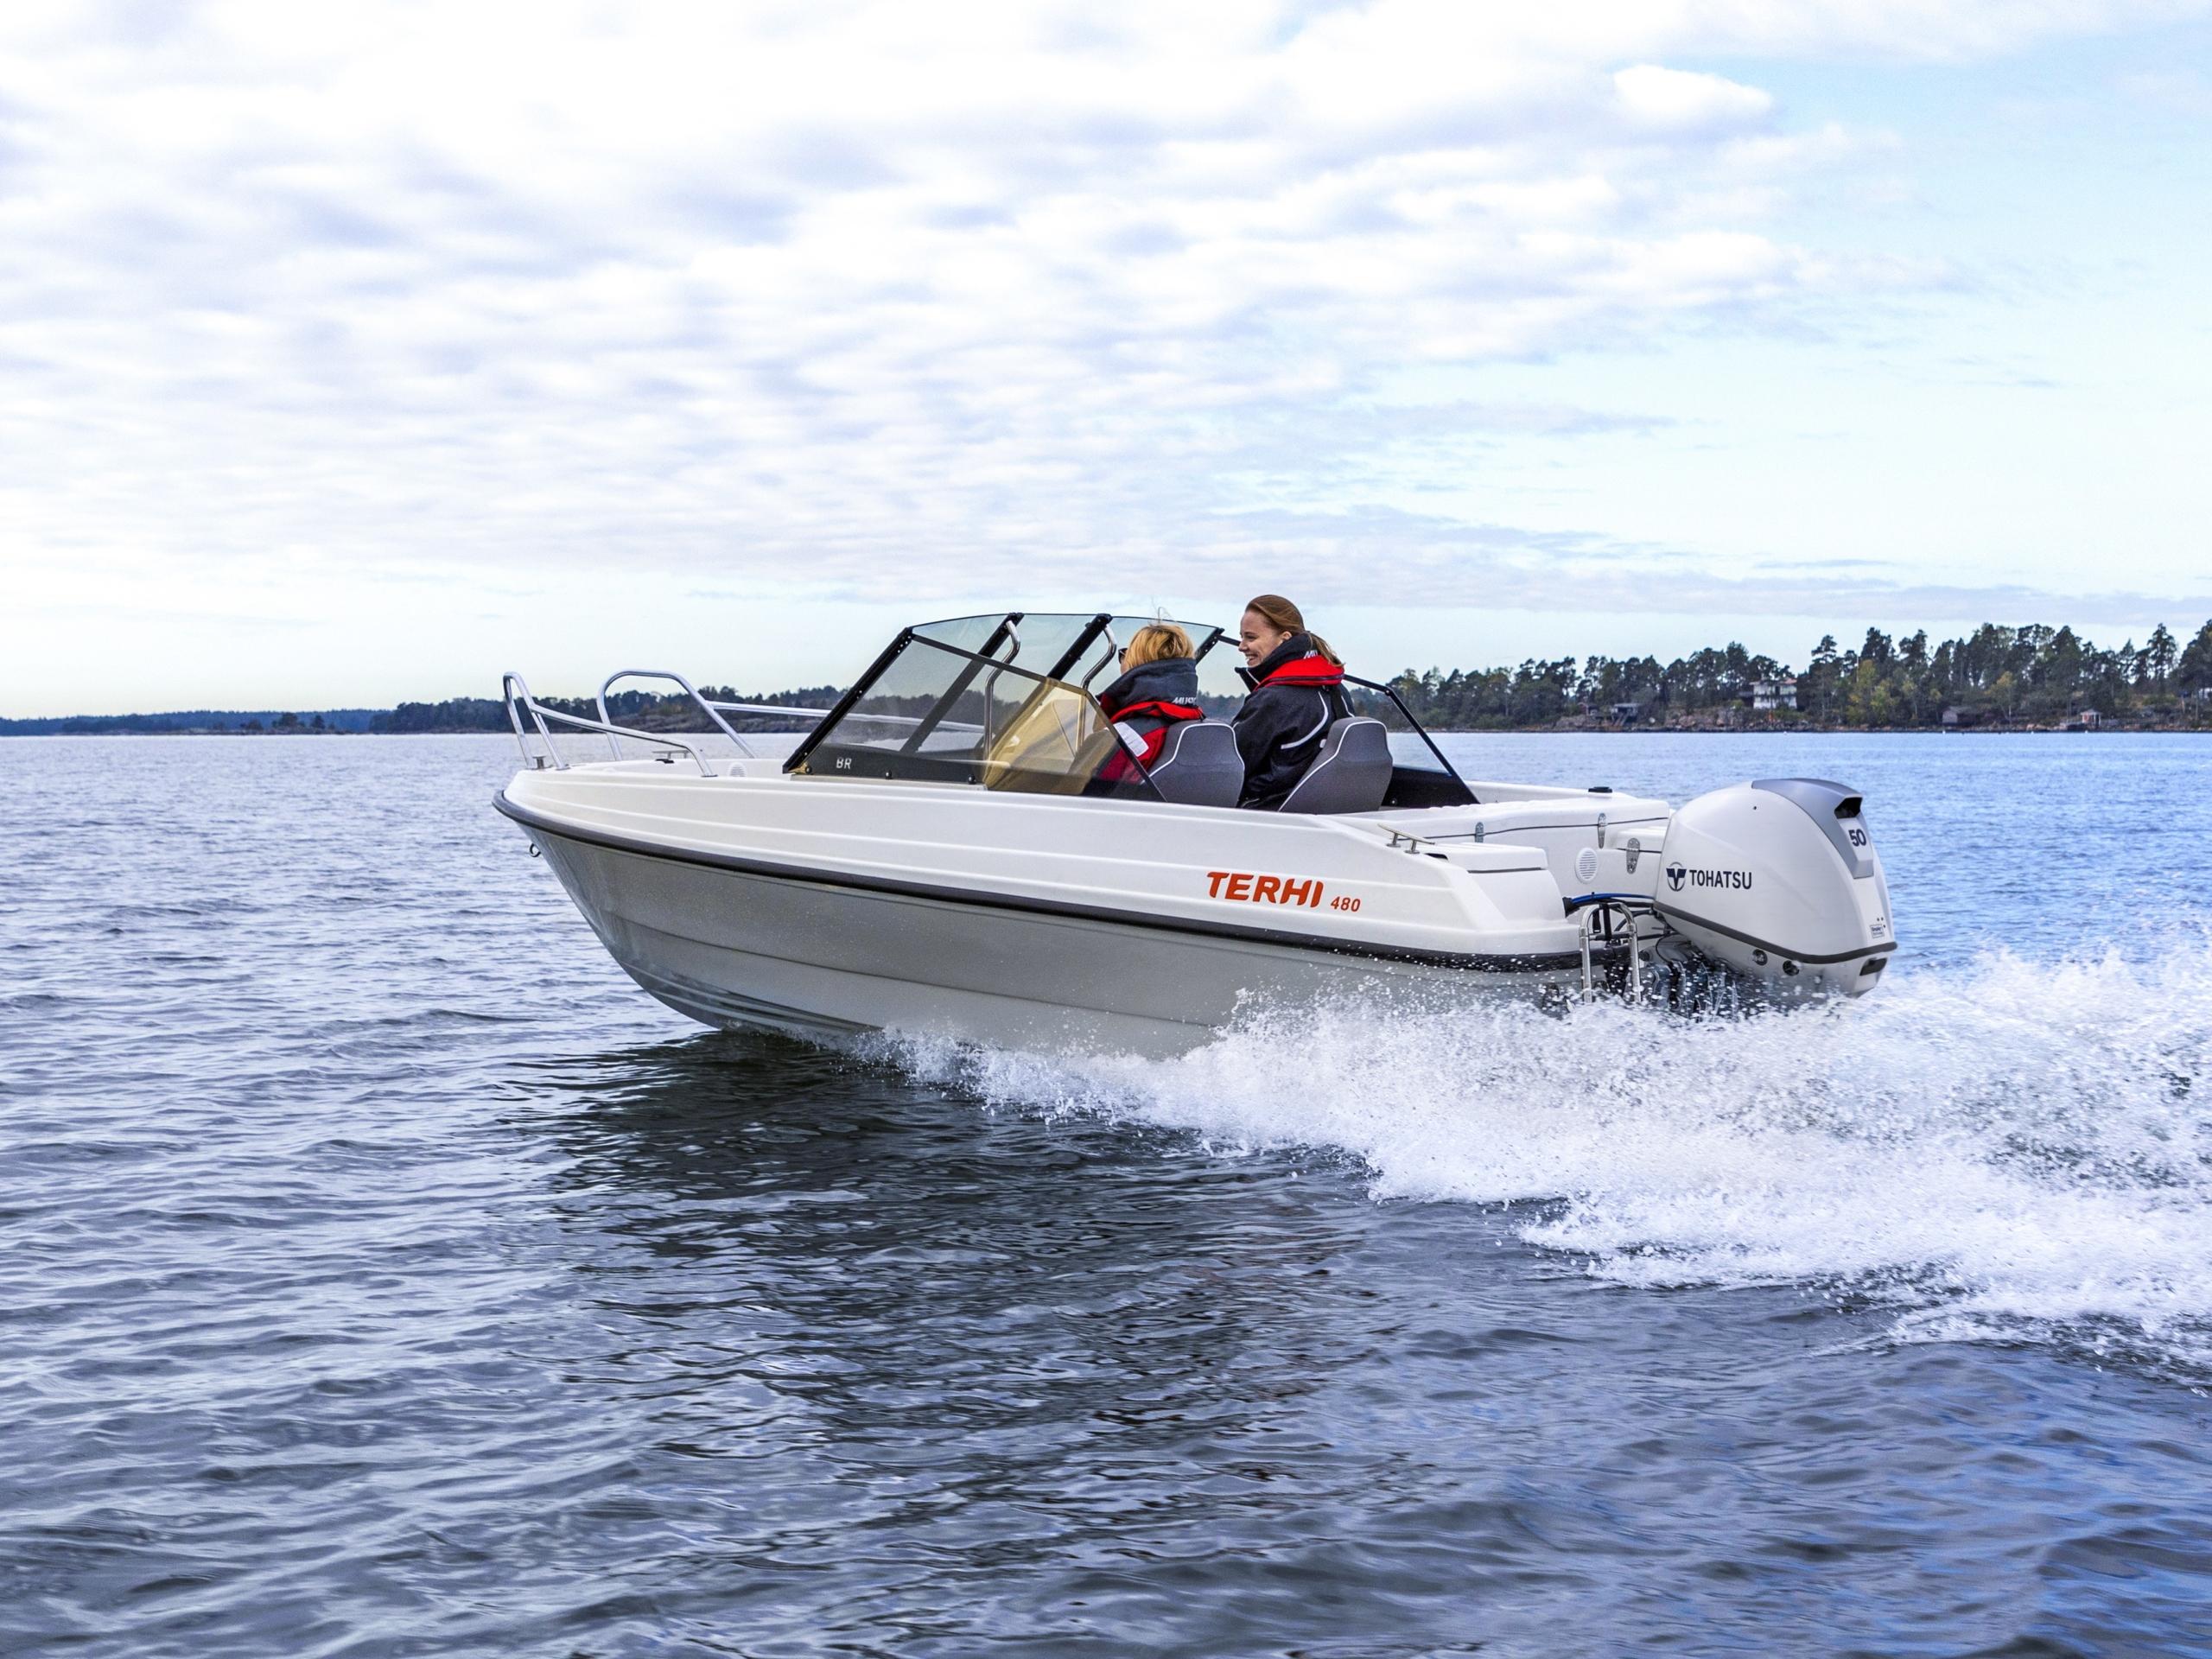 Terhi 480 båt